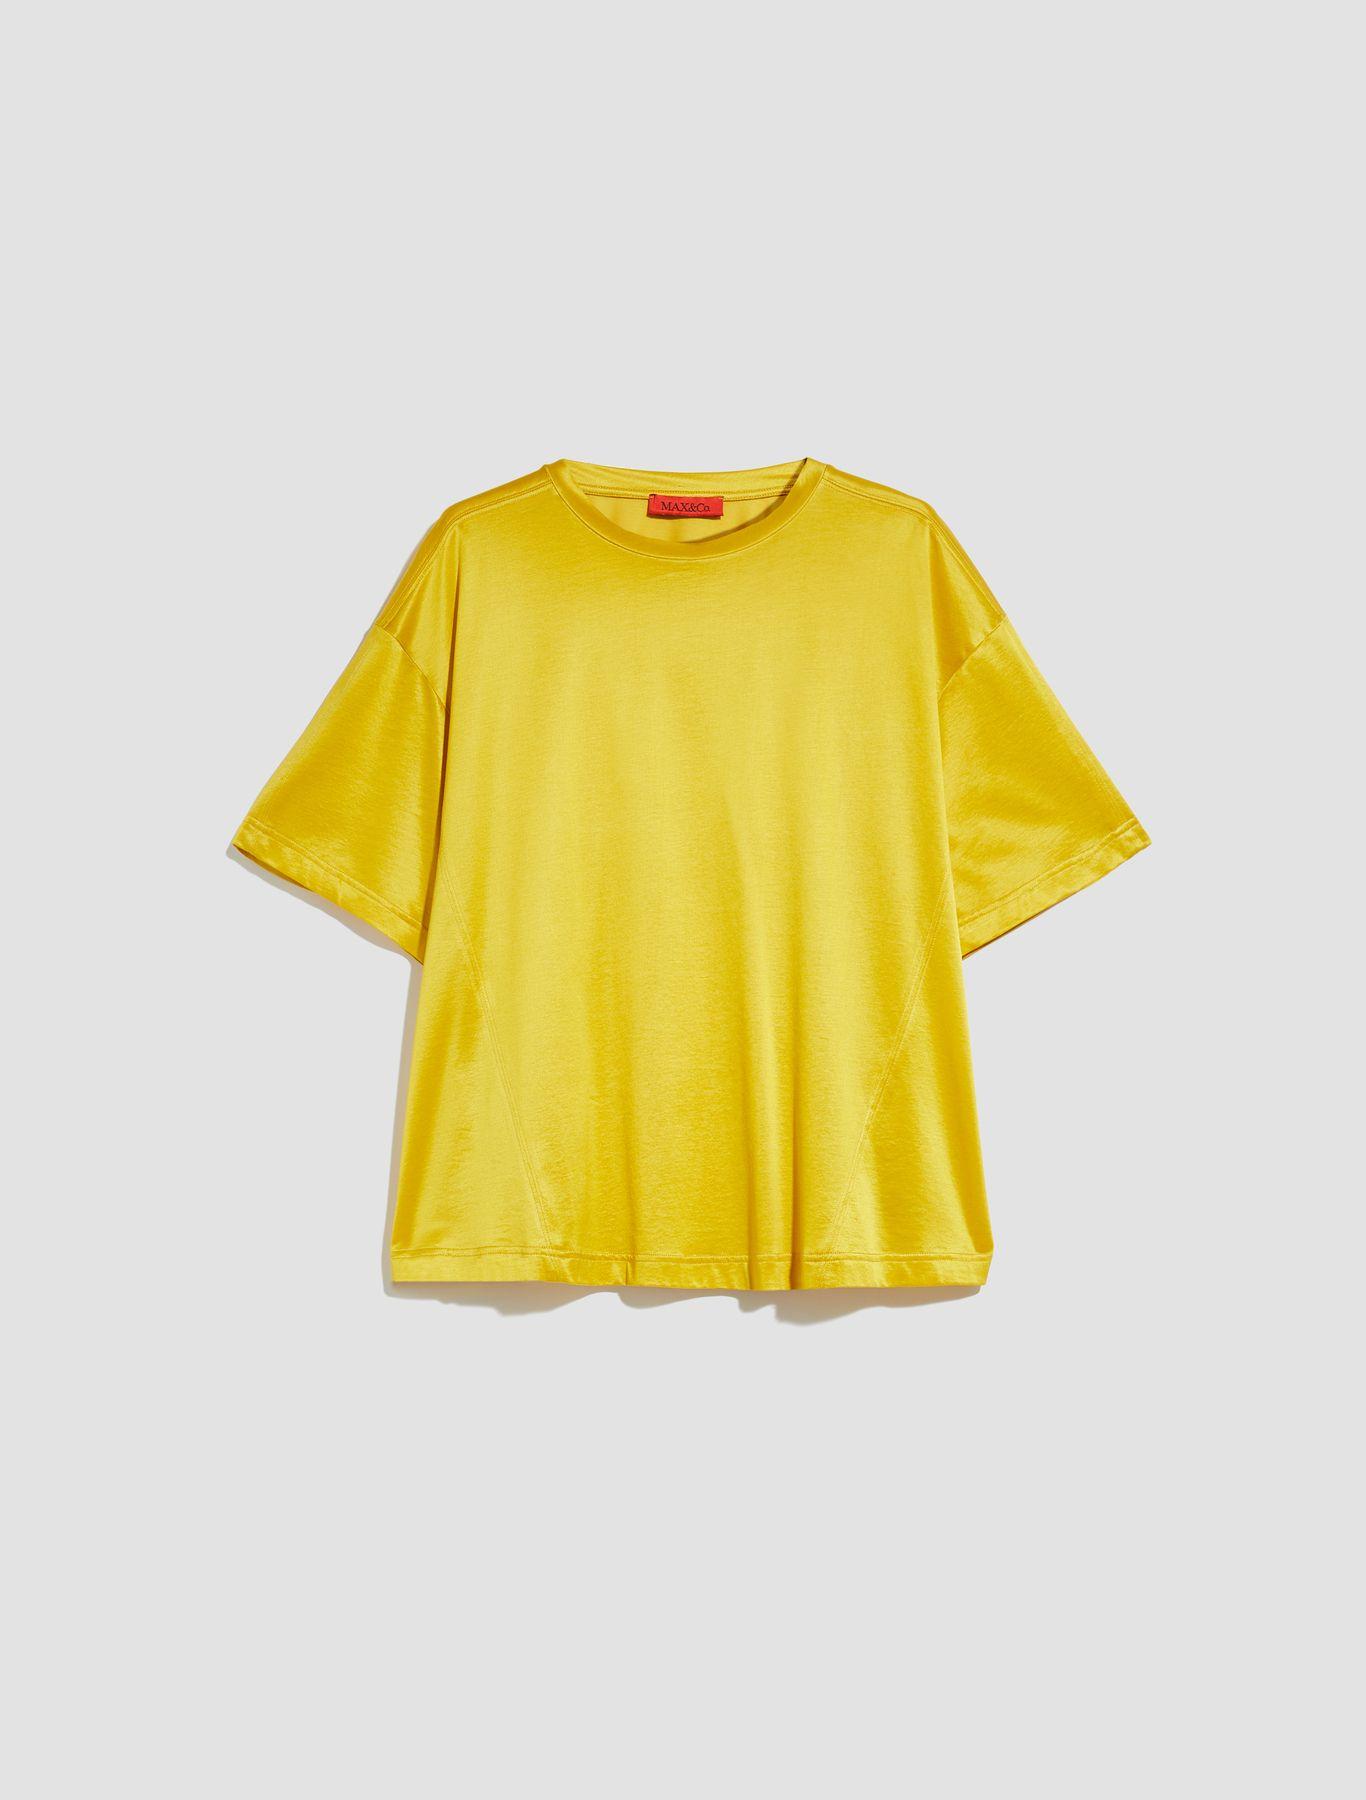 DARIA T-shirt mustard 5